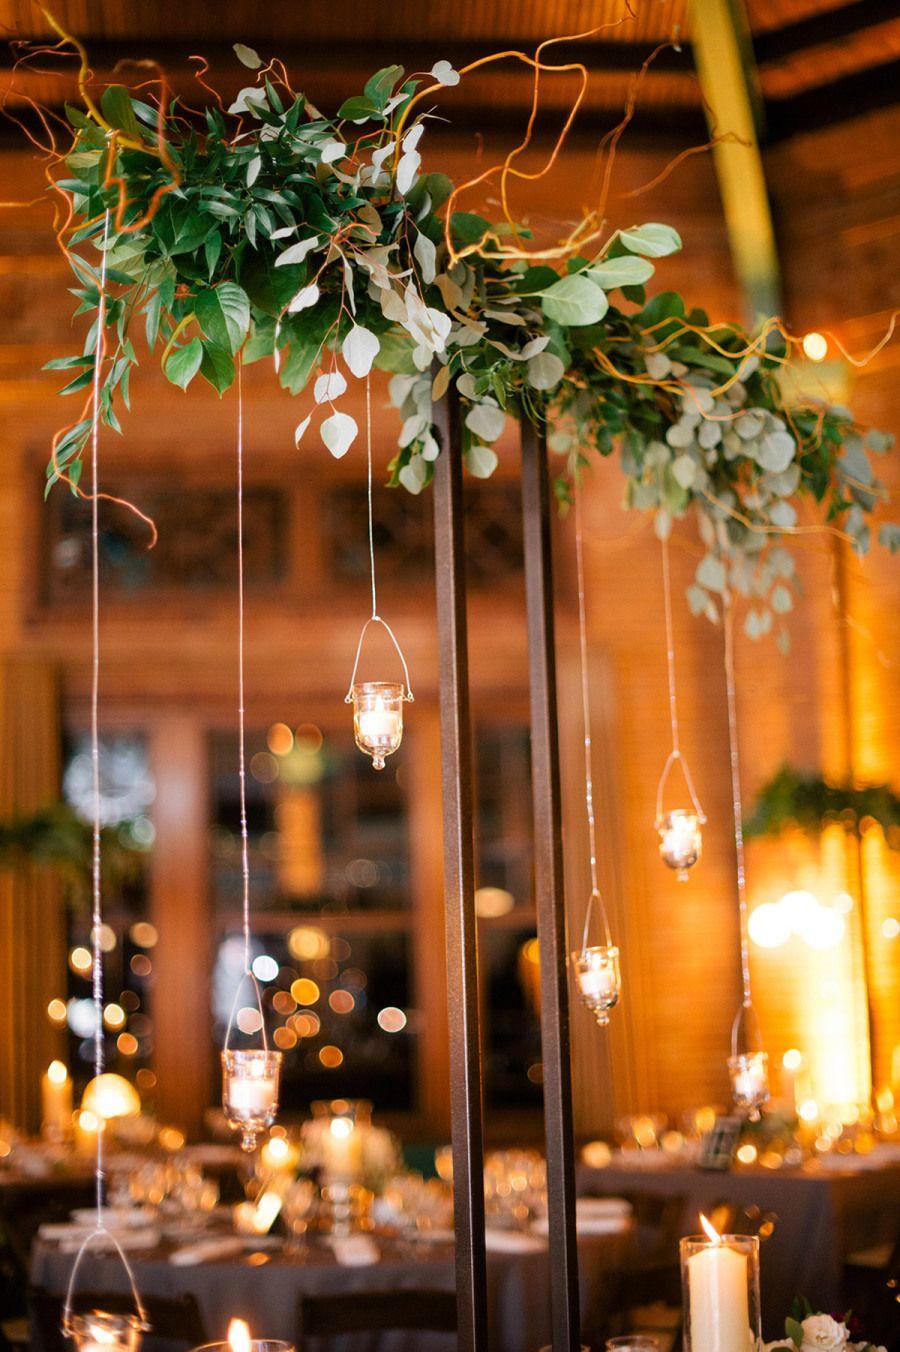 Venue: Cafe Brauer - http://www.stylemepretty.com/portfolio/cafe-brauer Event Planning: Kehoe Designs - http://www.stylemepretty.com/portfolio/kehoe-designs Floral Design: Kehoe Designs - http://www.stylemepretty.com/portfolio/kehoe-designs   Read More on SMP: http://www.stylemepretty.com/2015/06/22/elegant-prairie-style-chicago-wedding/